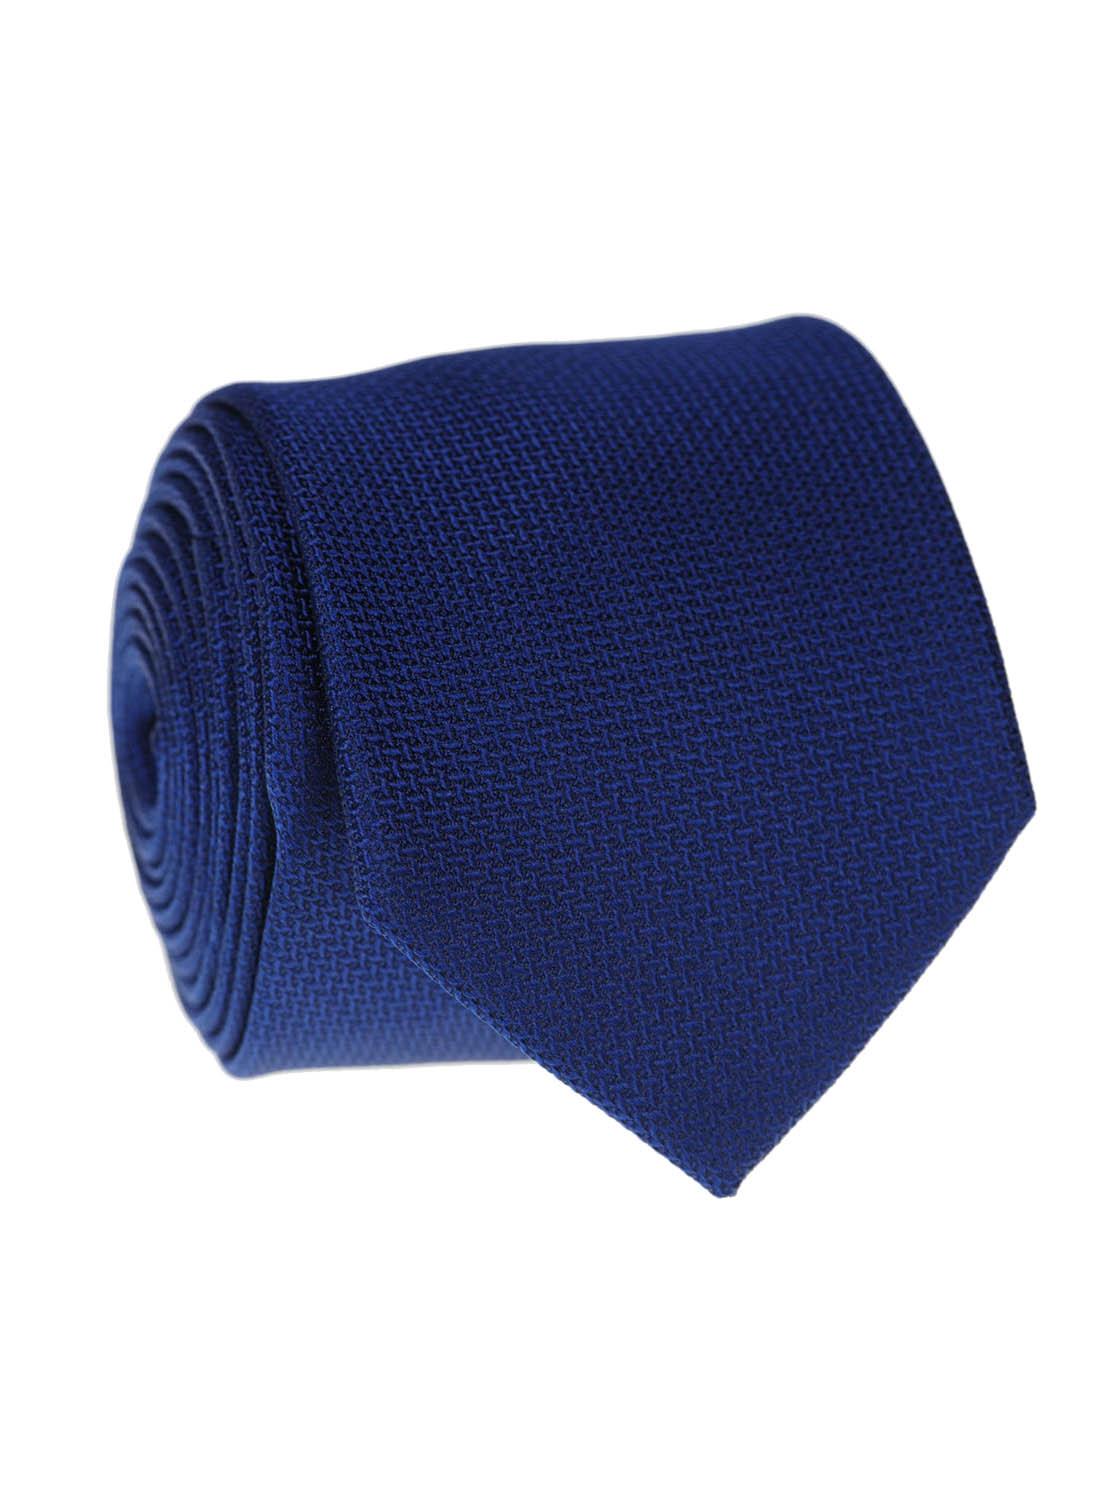 Pánská kravata Terry navy